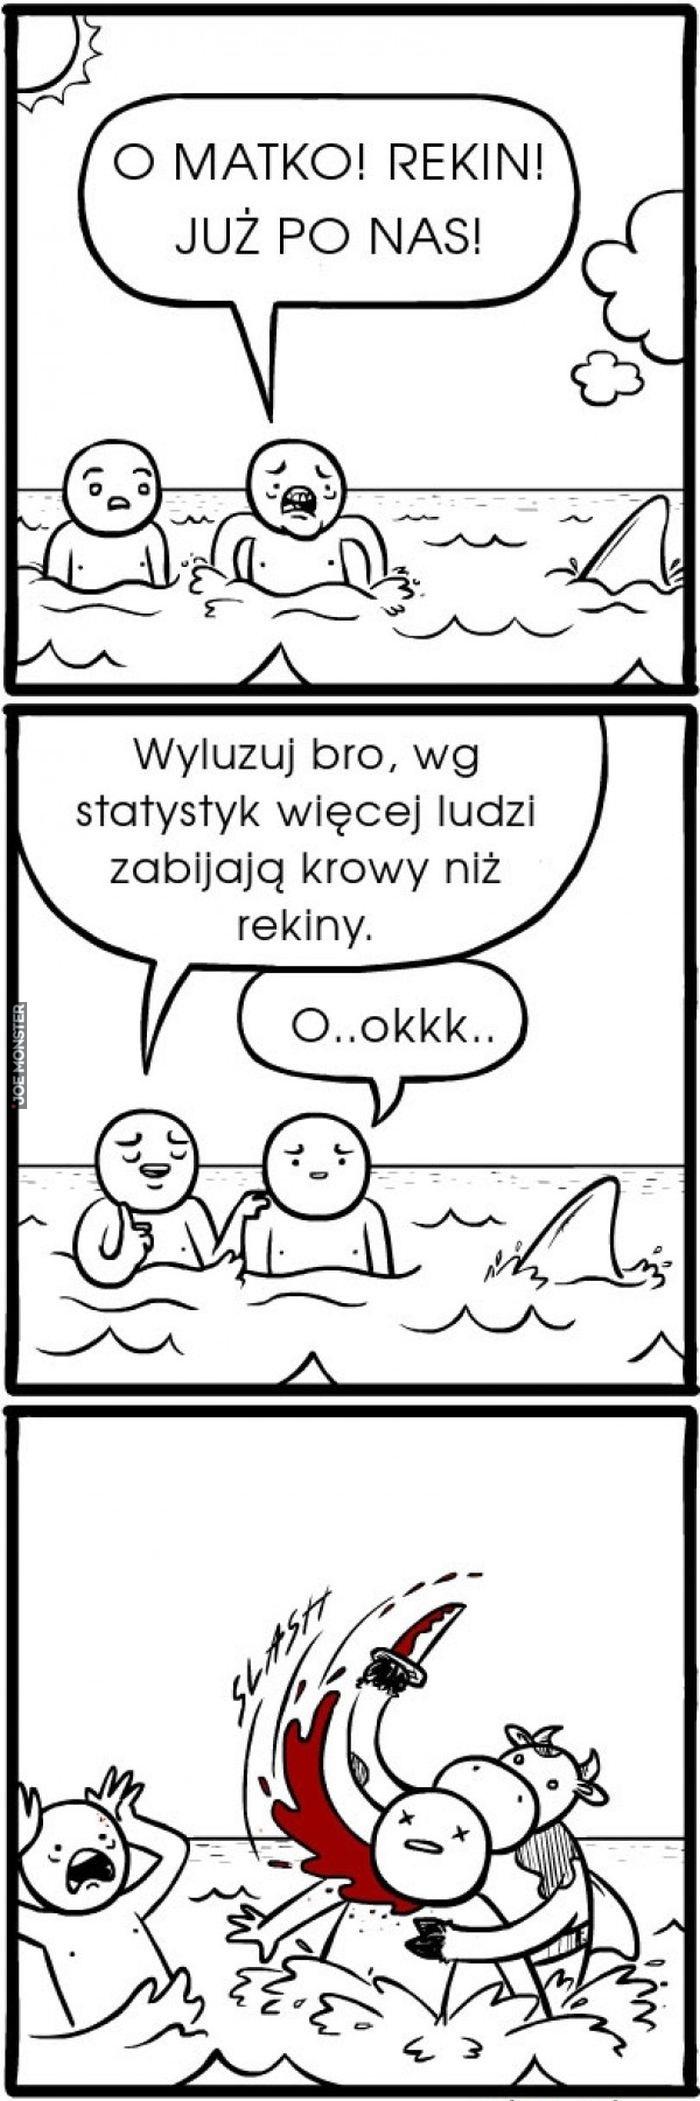 p matko rekin już po nas